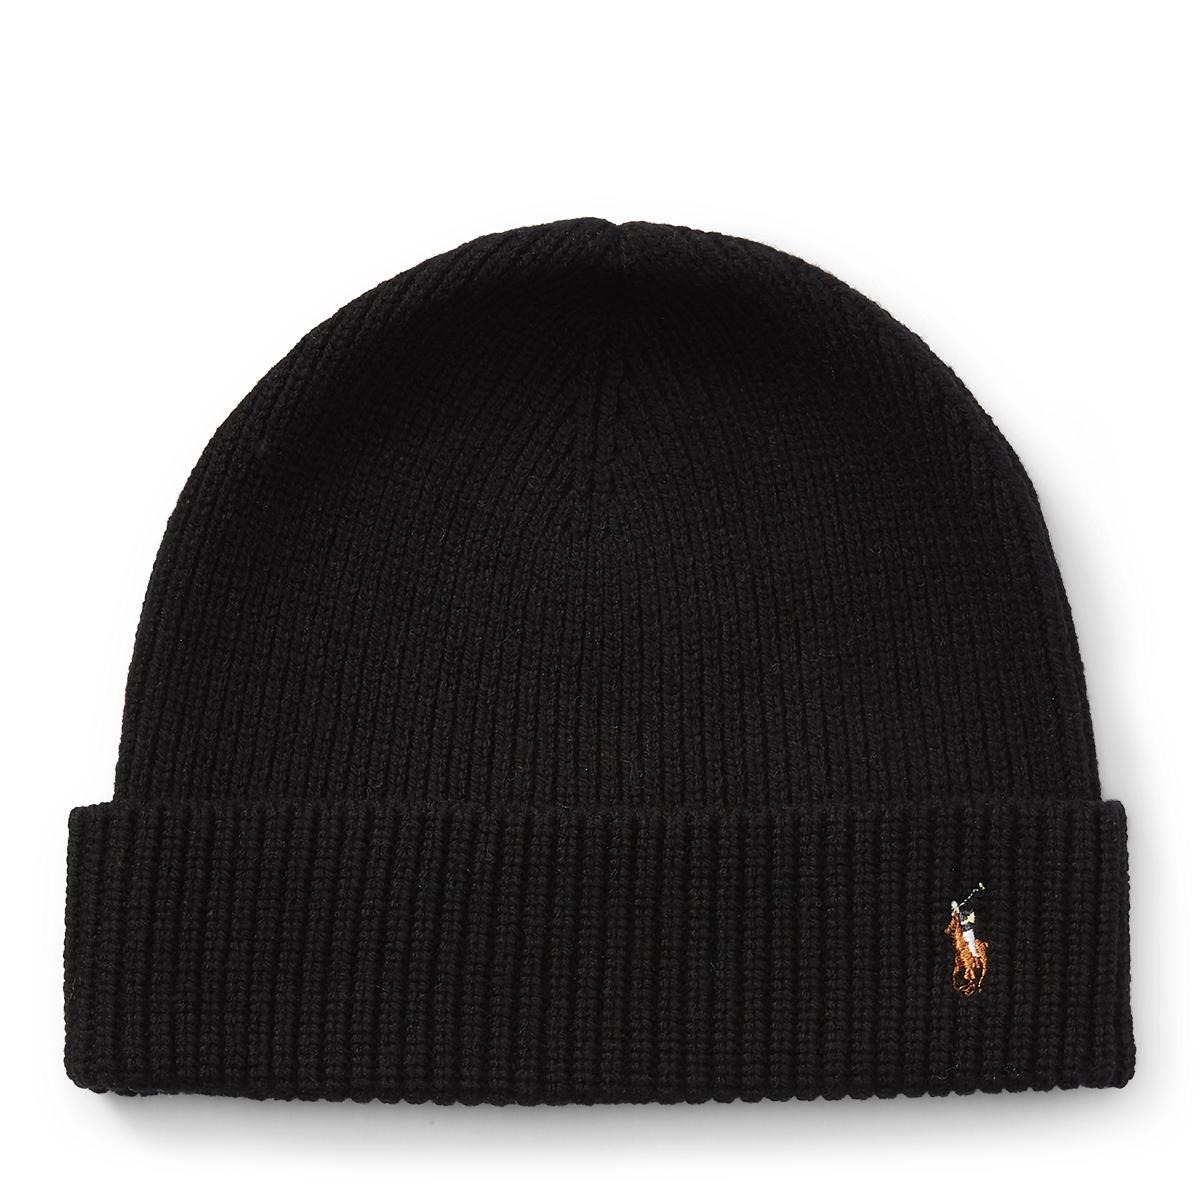 a3f334e4 Signature Merino Cuff Hat | Hats Hats, Scarves & Gloves | Ralph Lauren